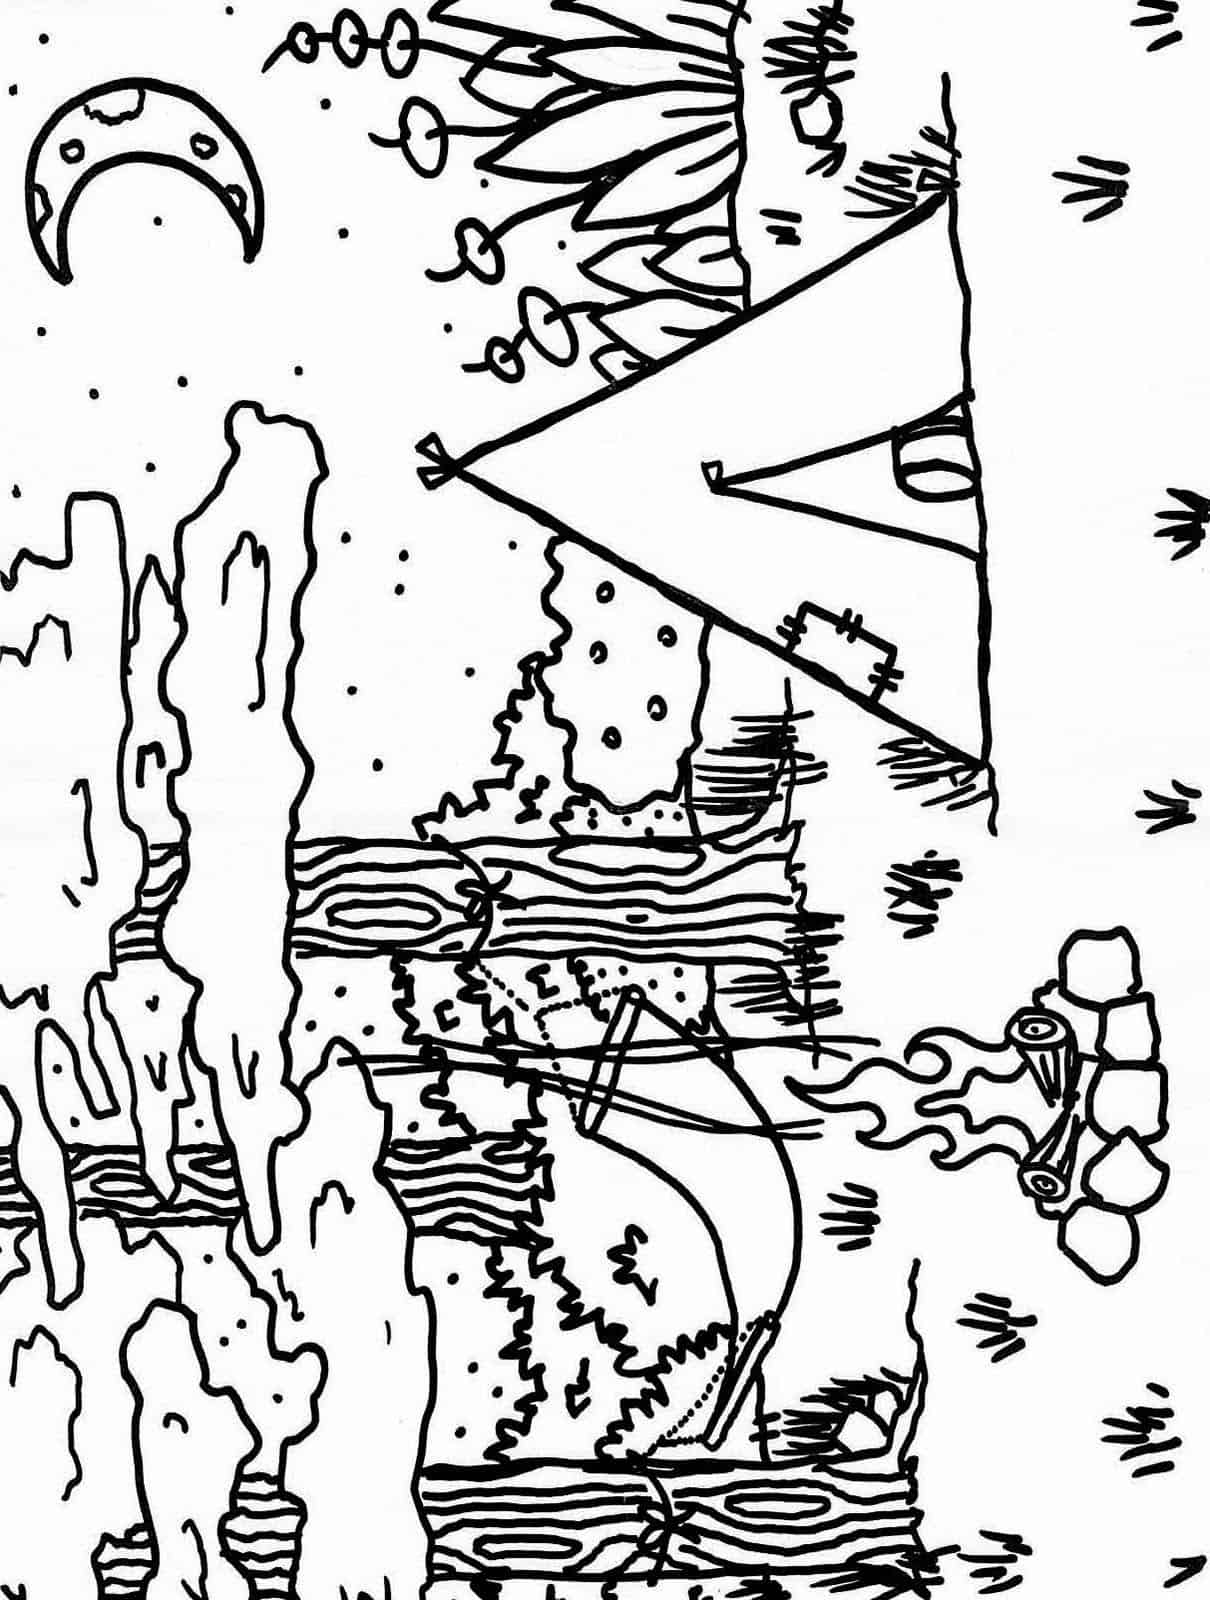 kamperen-camping-kleurplaat-03